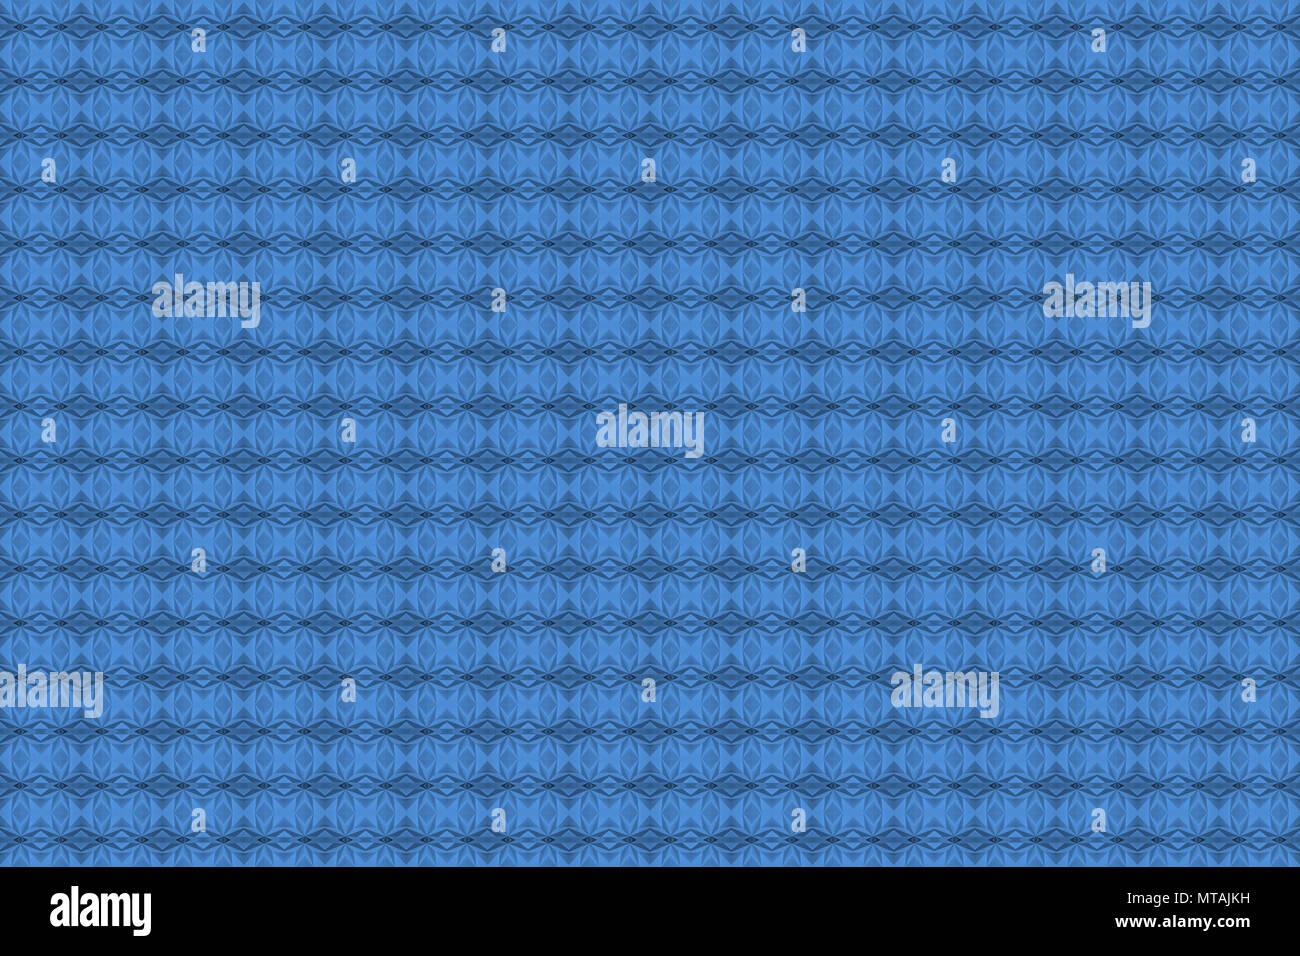 https www alamy com blue pantone 16 4132 little boy blue tile wallpaper background abstract pattern seamless monochrome graphic design pattern image187089605 html